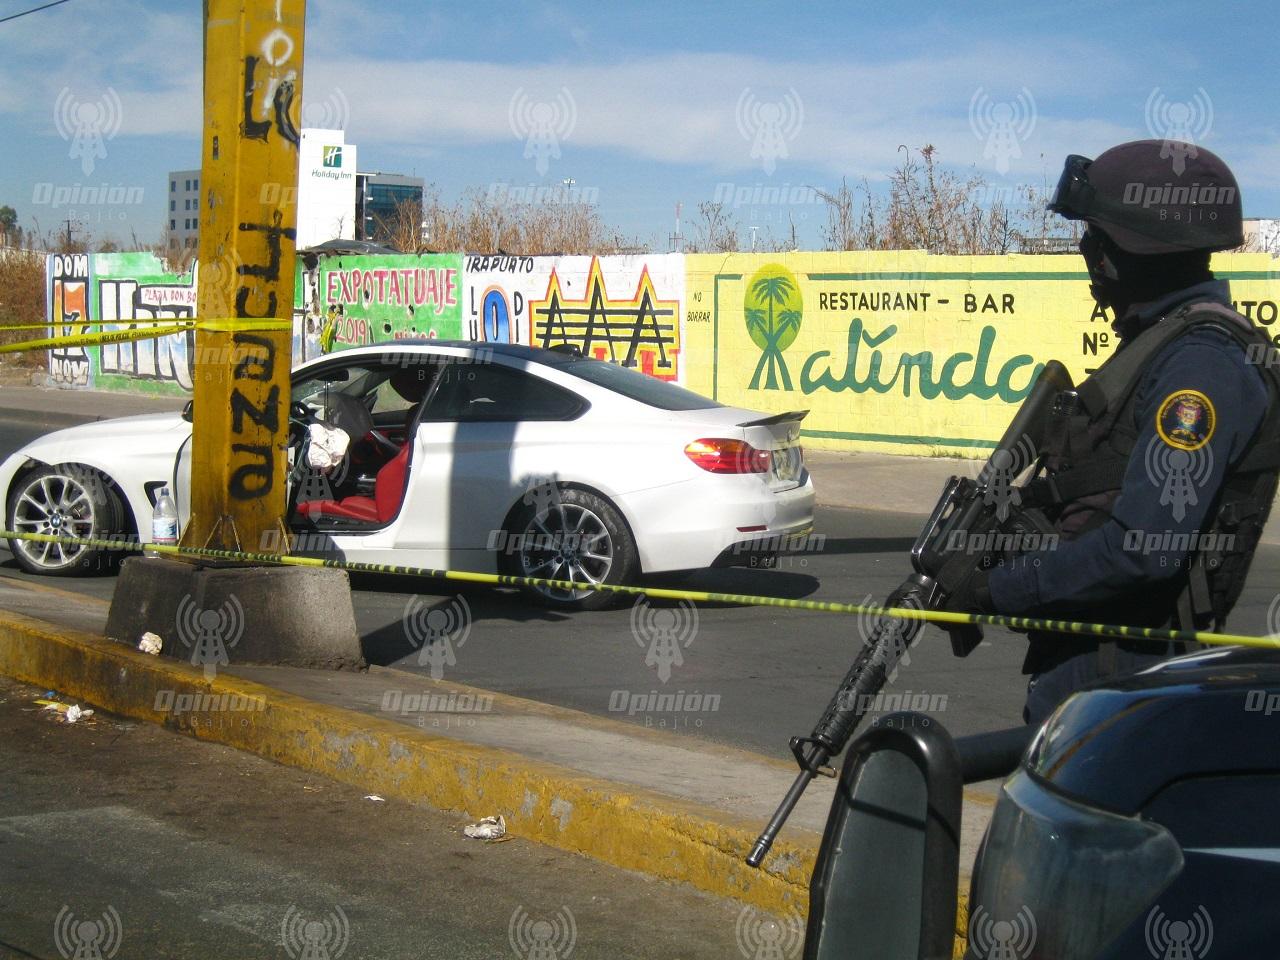 Grupo armado ataca auto de lujo en pleno crucero vial; 2 heridos